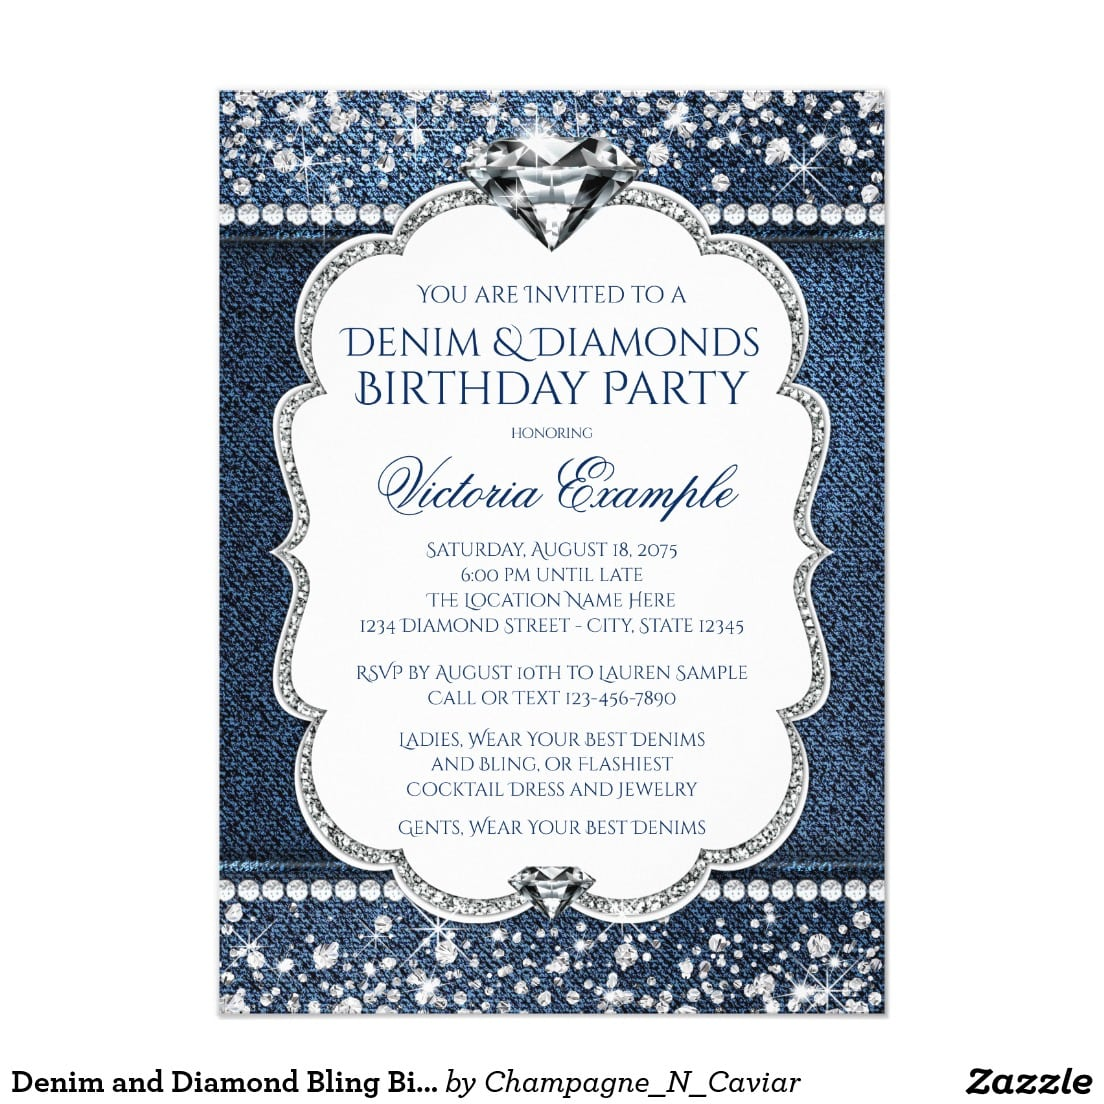 35th Birthday Party Invitations